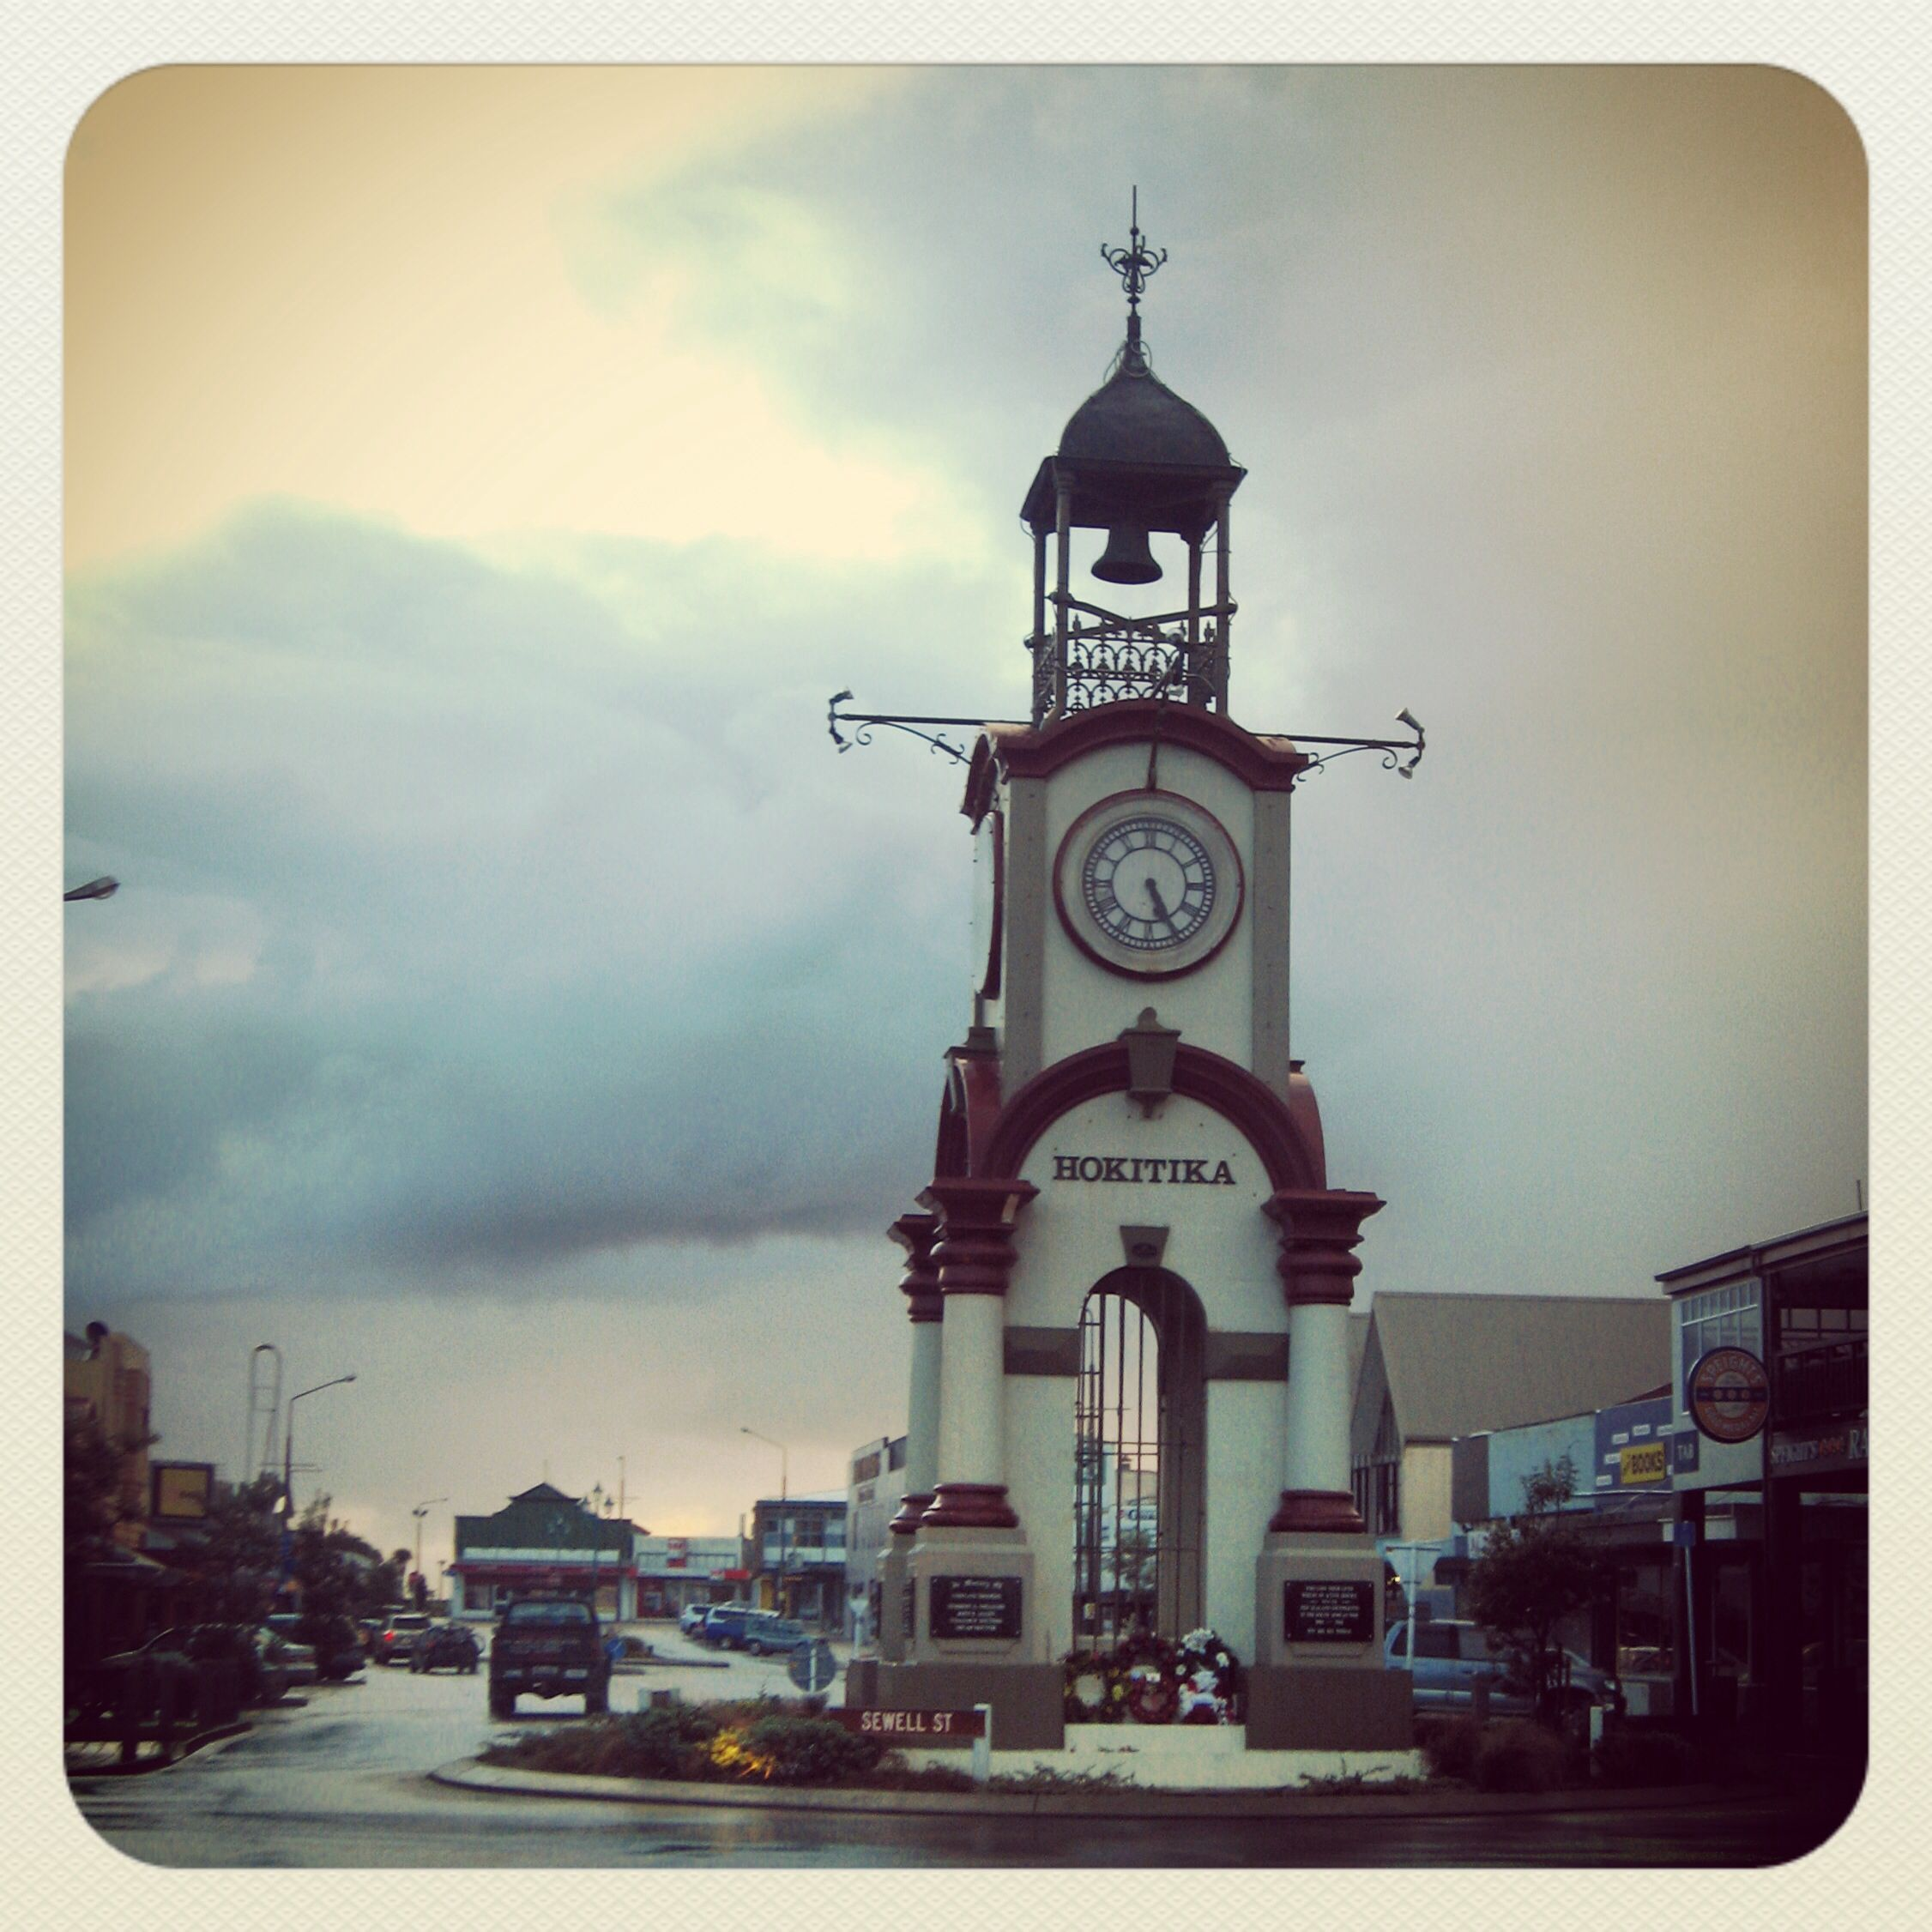 Hokitika - New Zealand